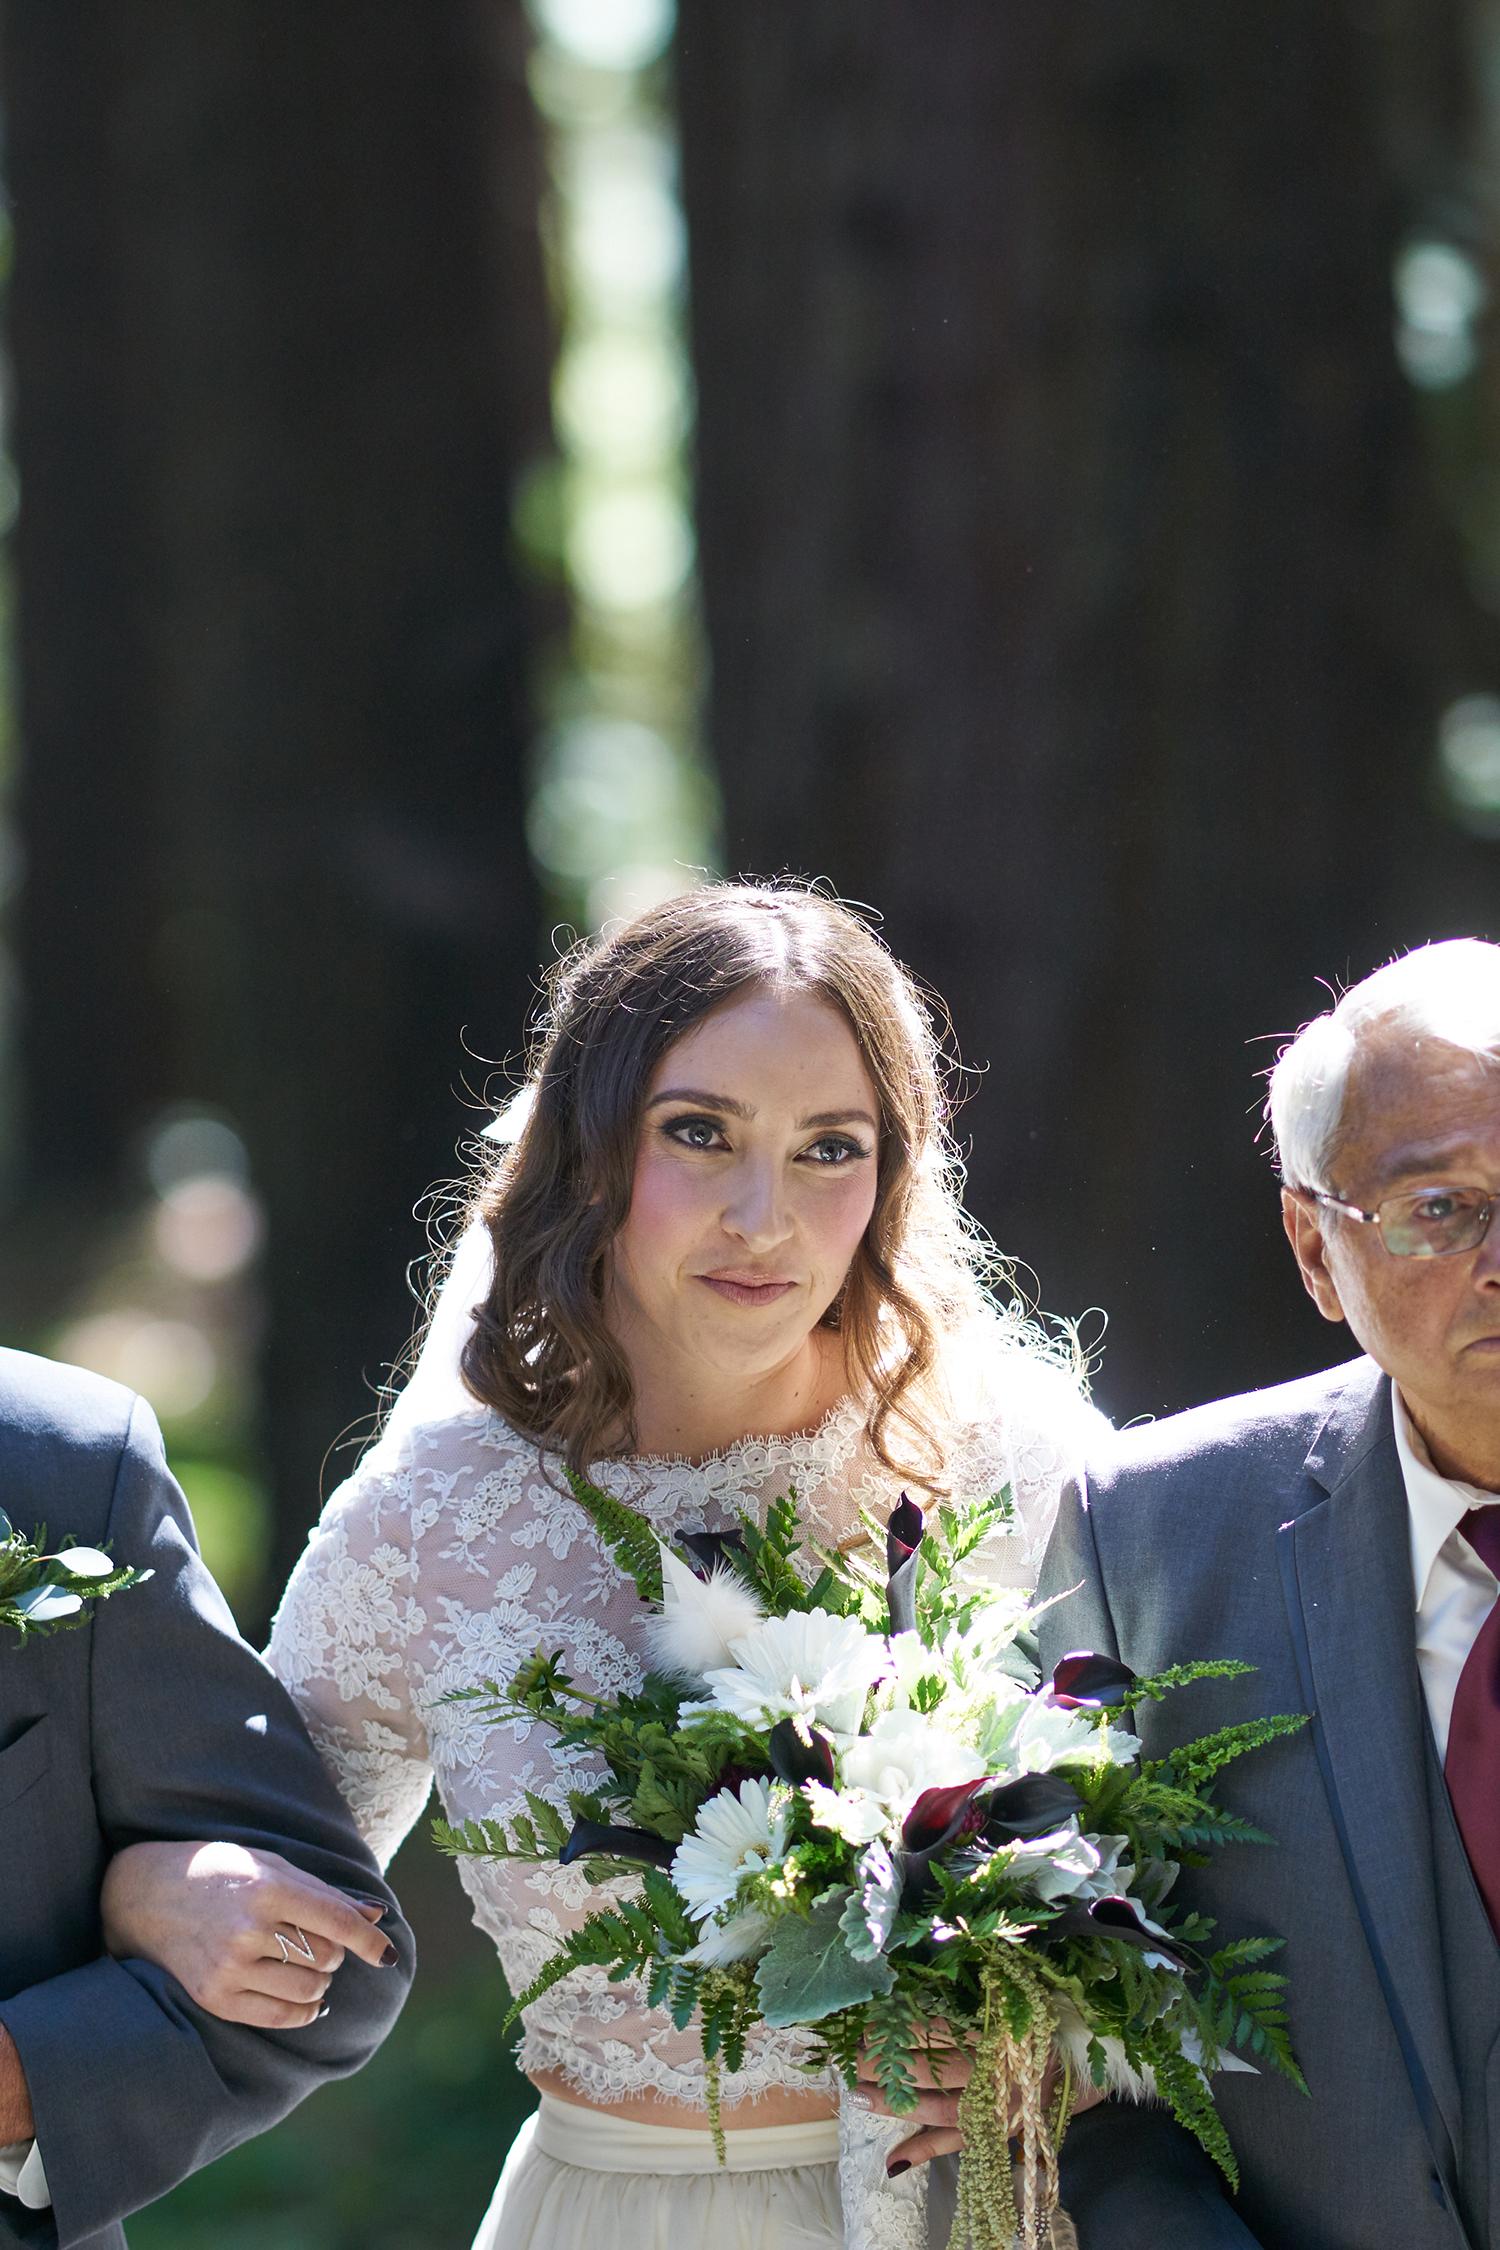 100717_Lenora_Jesse0141-weddingdress-bride-weddingphotography-best-weddingphotographer-bridal-groom-wedding-engagementring-proposal-brides-diamondring-sonyalpha-sony-sonya7rii-sanfrancisco-sf-bayarea-photographer-profoto-berkeley-botanical-garden.jpg